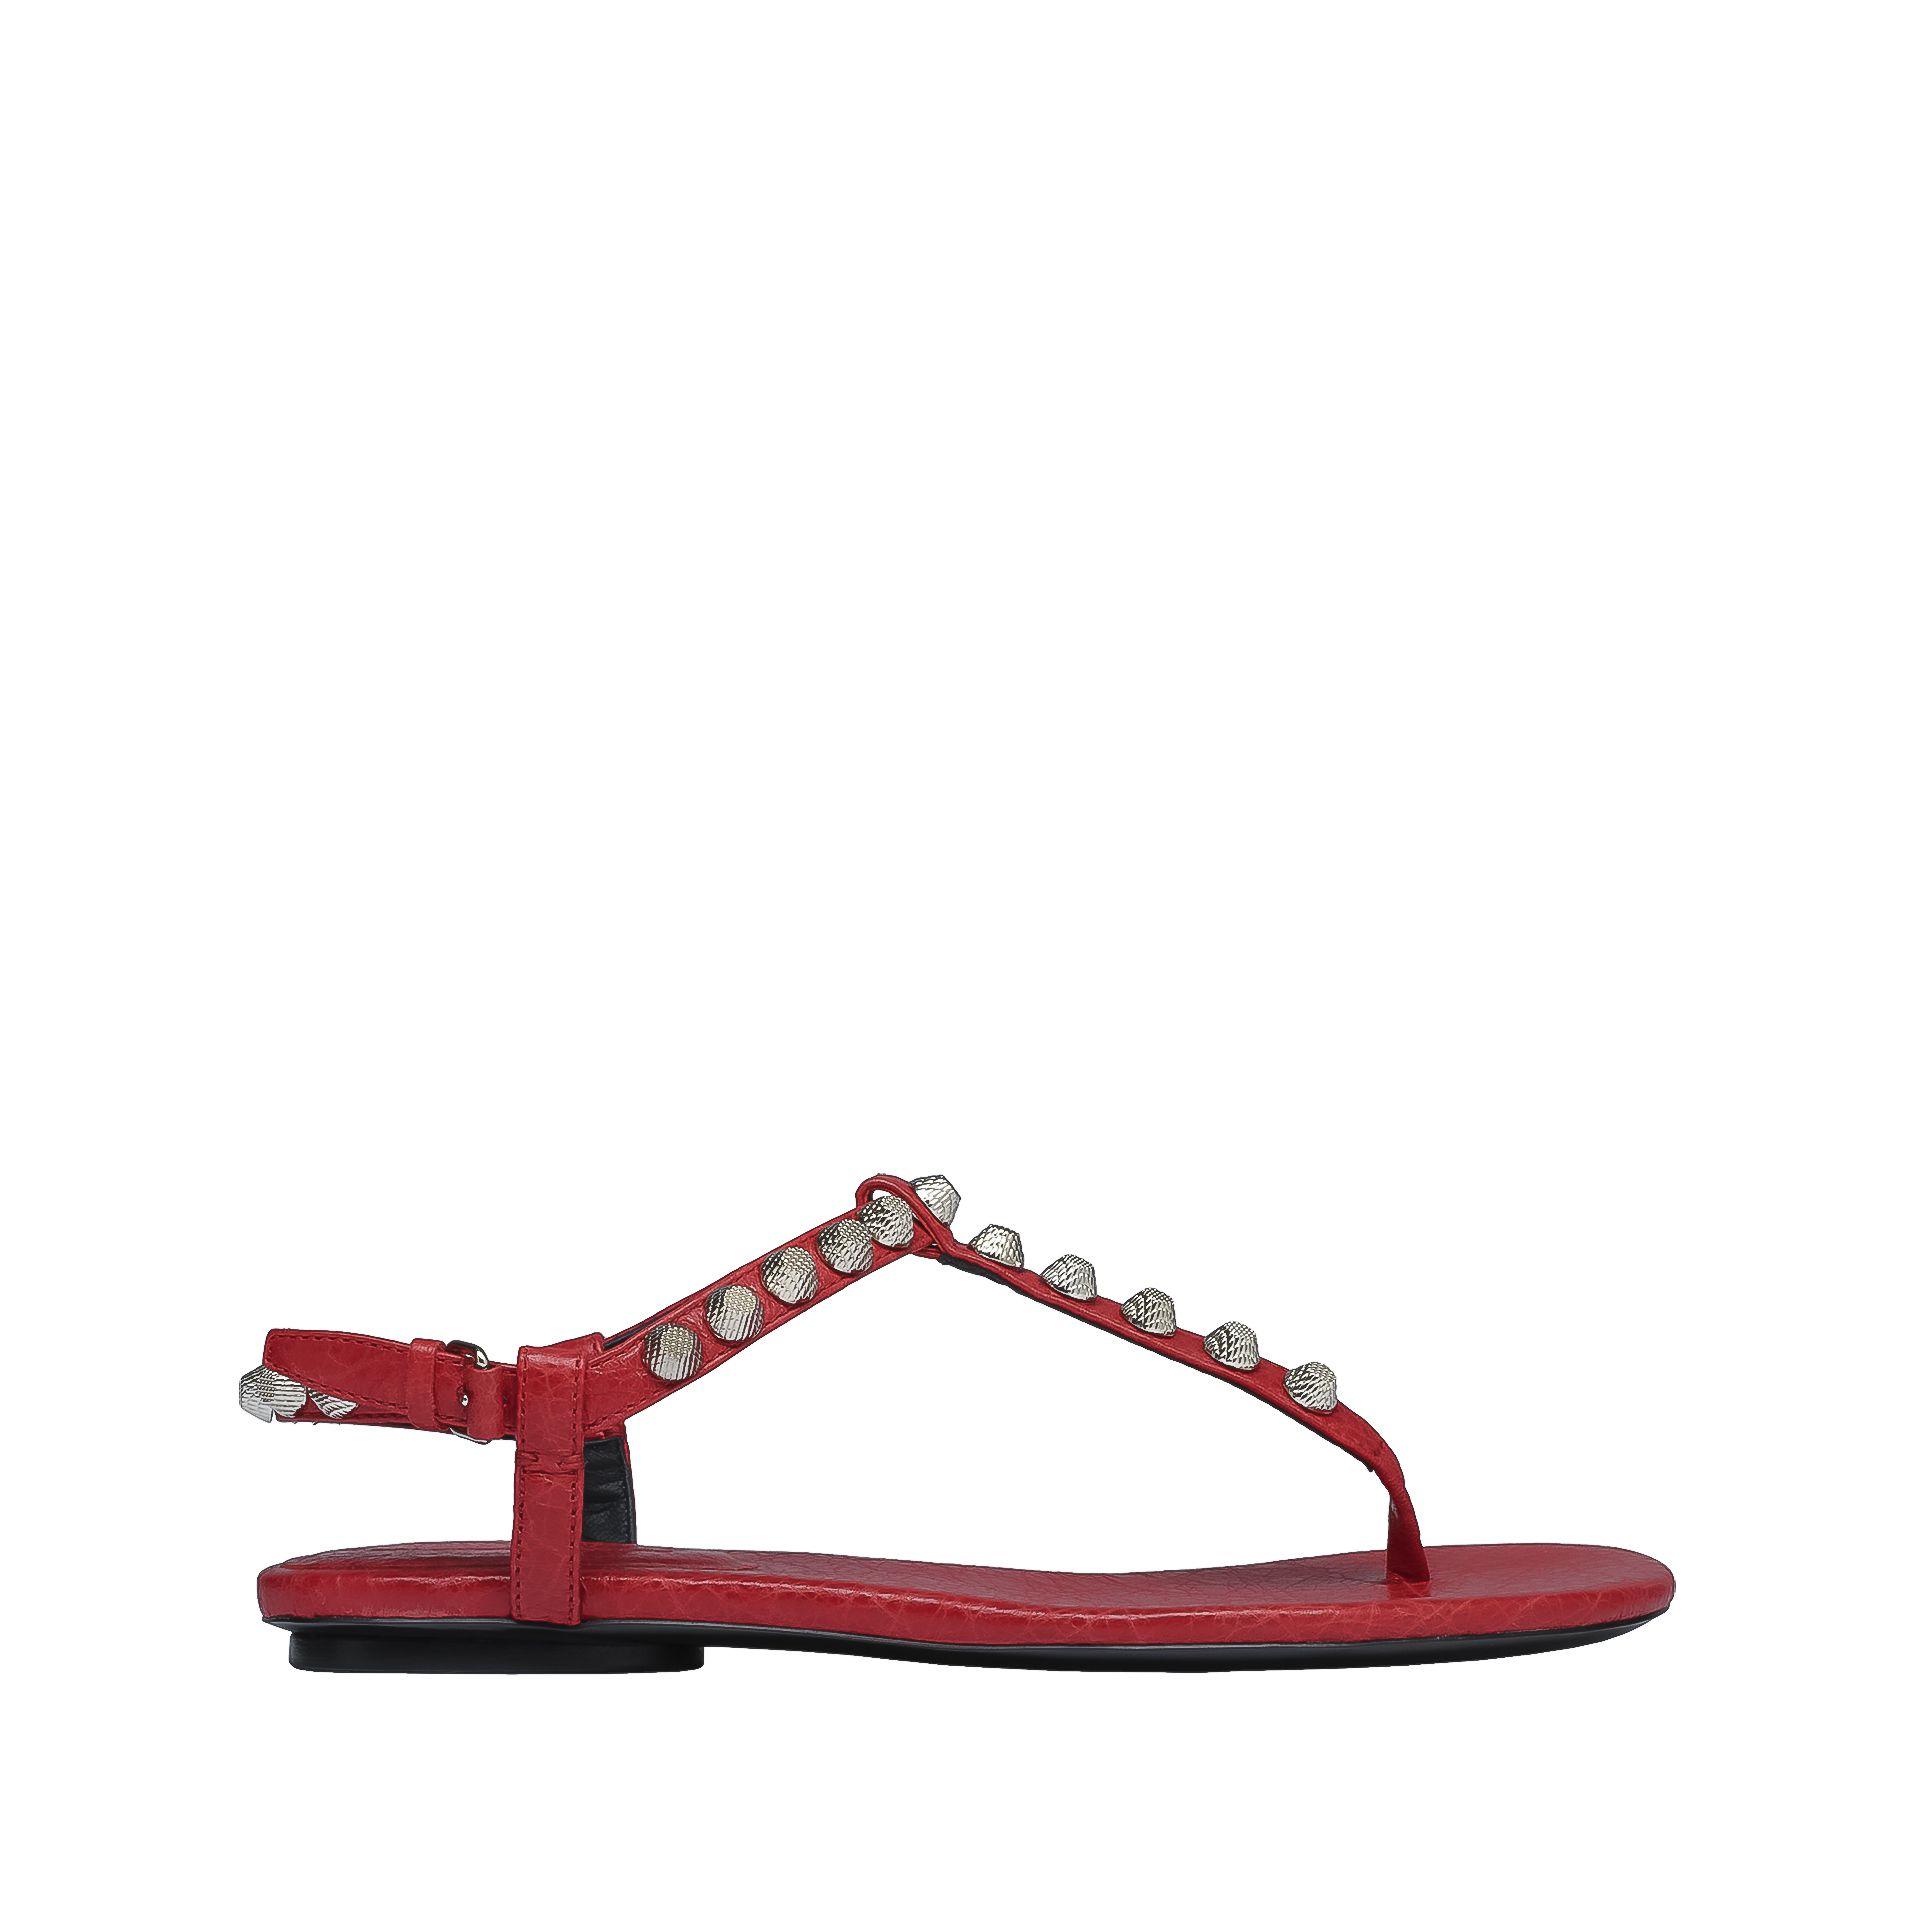 BALENCIAGA Balenciaga Giant Silver T Strap Sandals Sandal D f